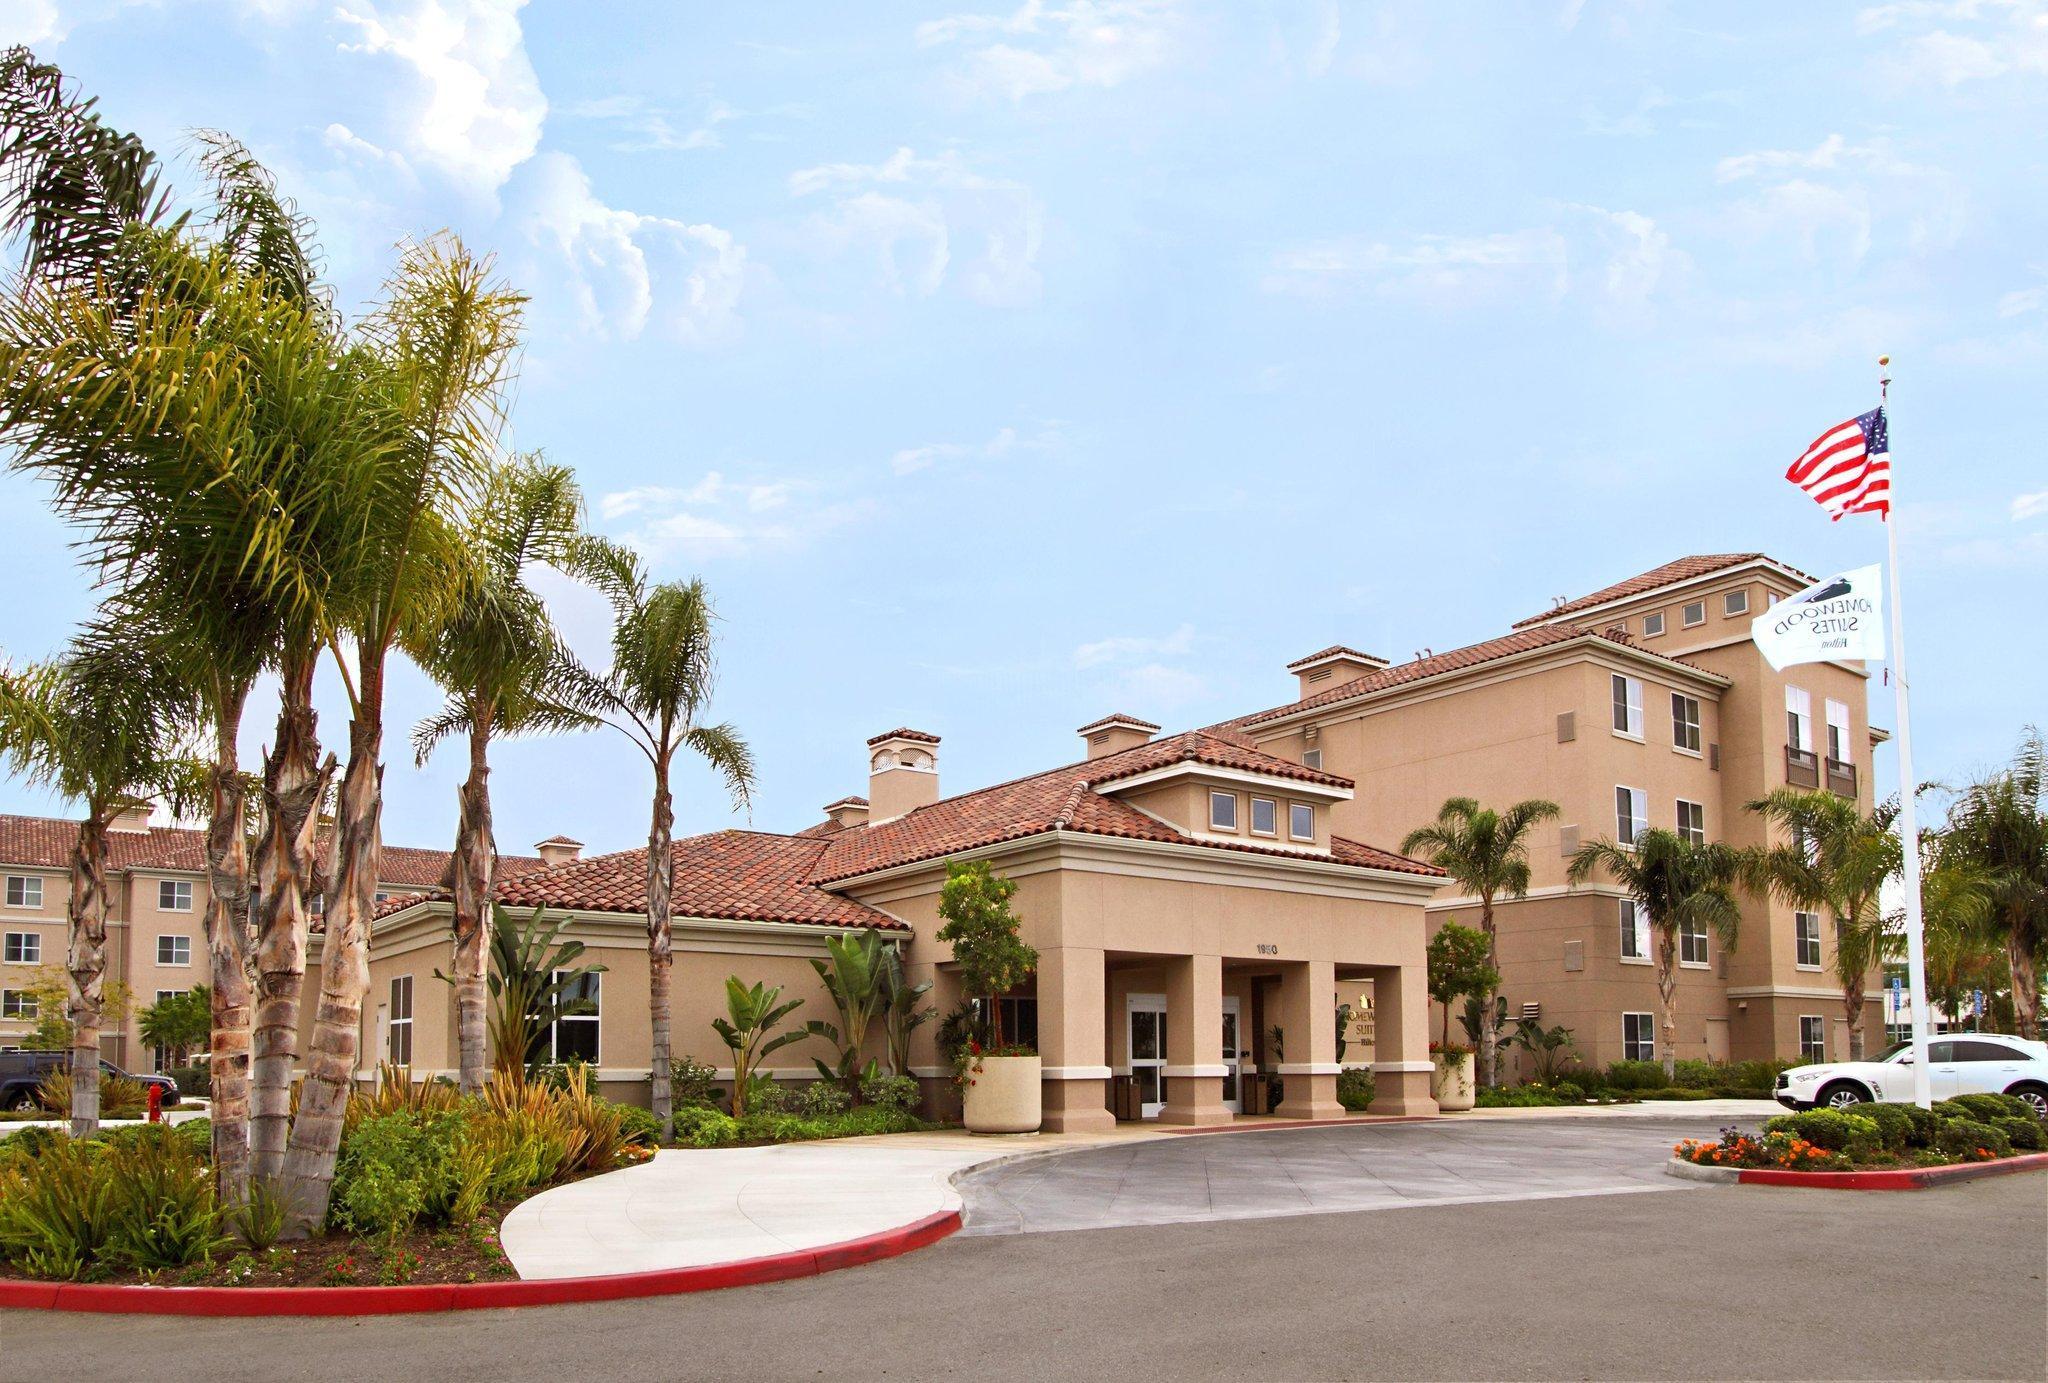 Homewood Suites By Hilton Oxnard Hotel